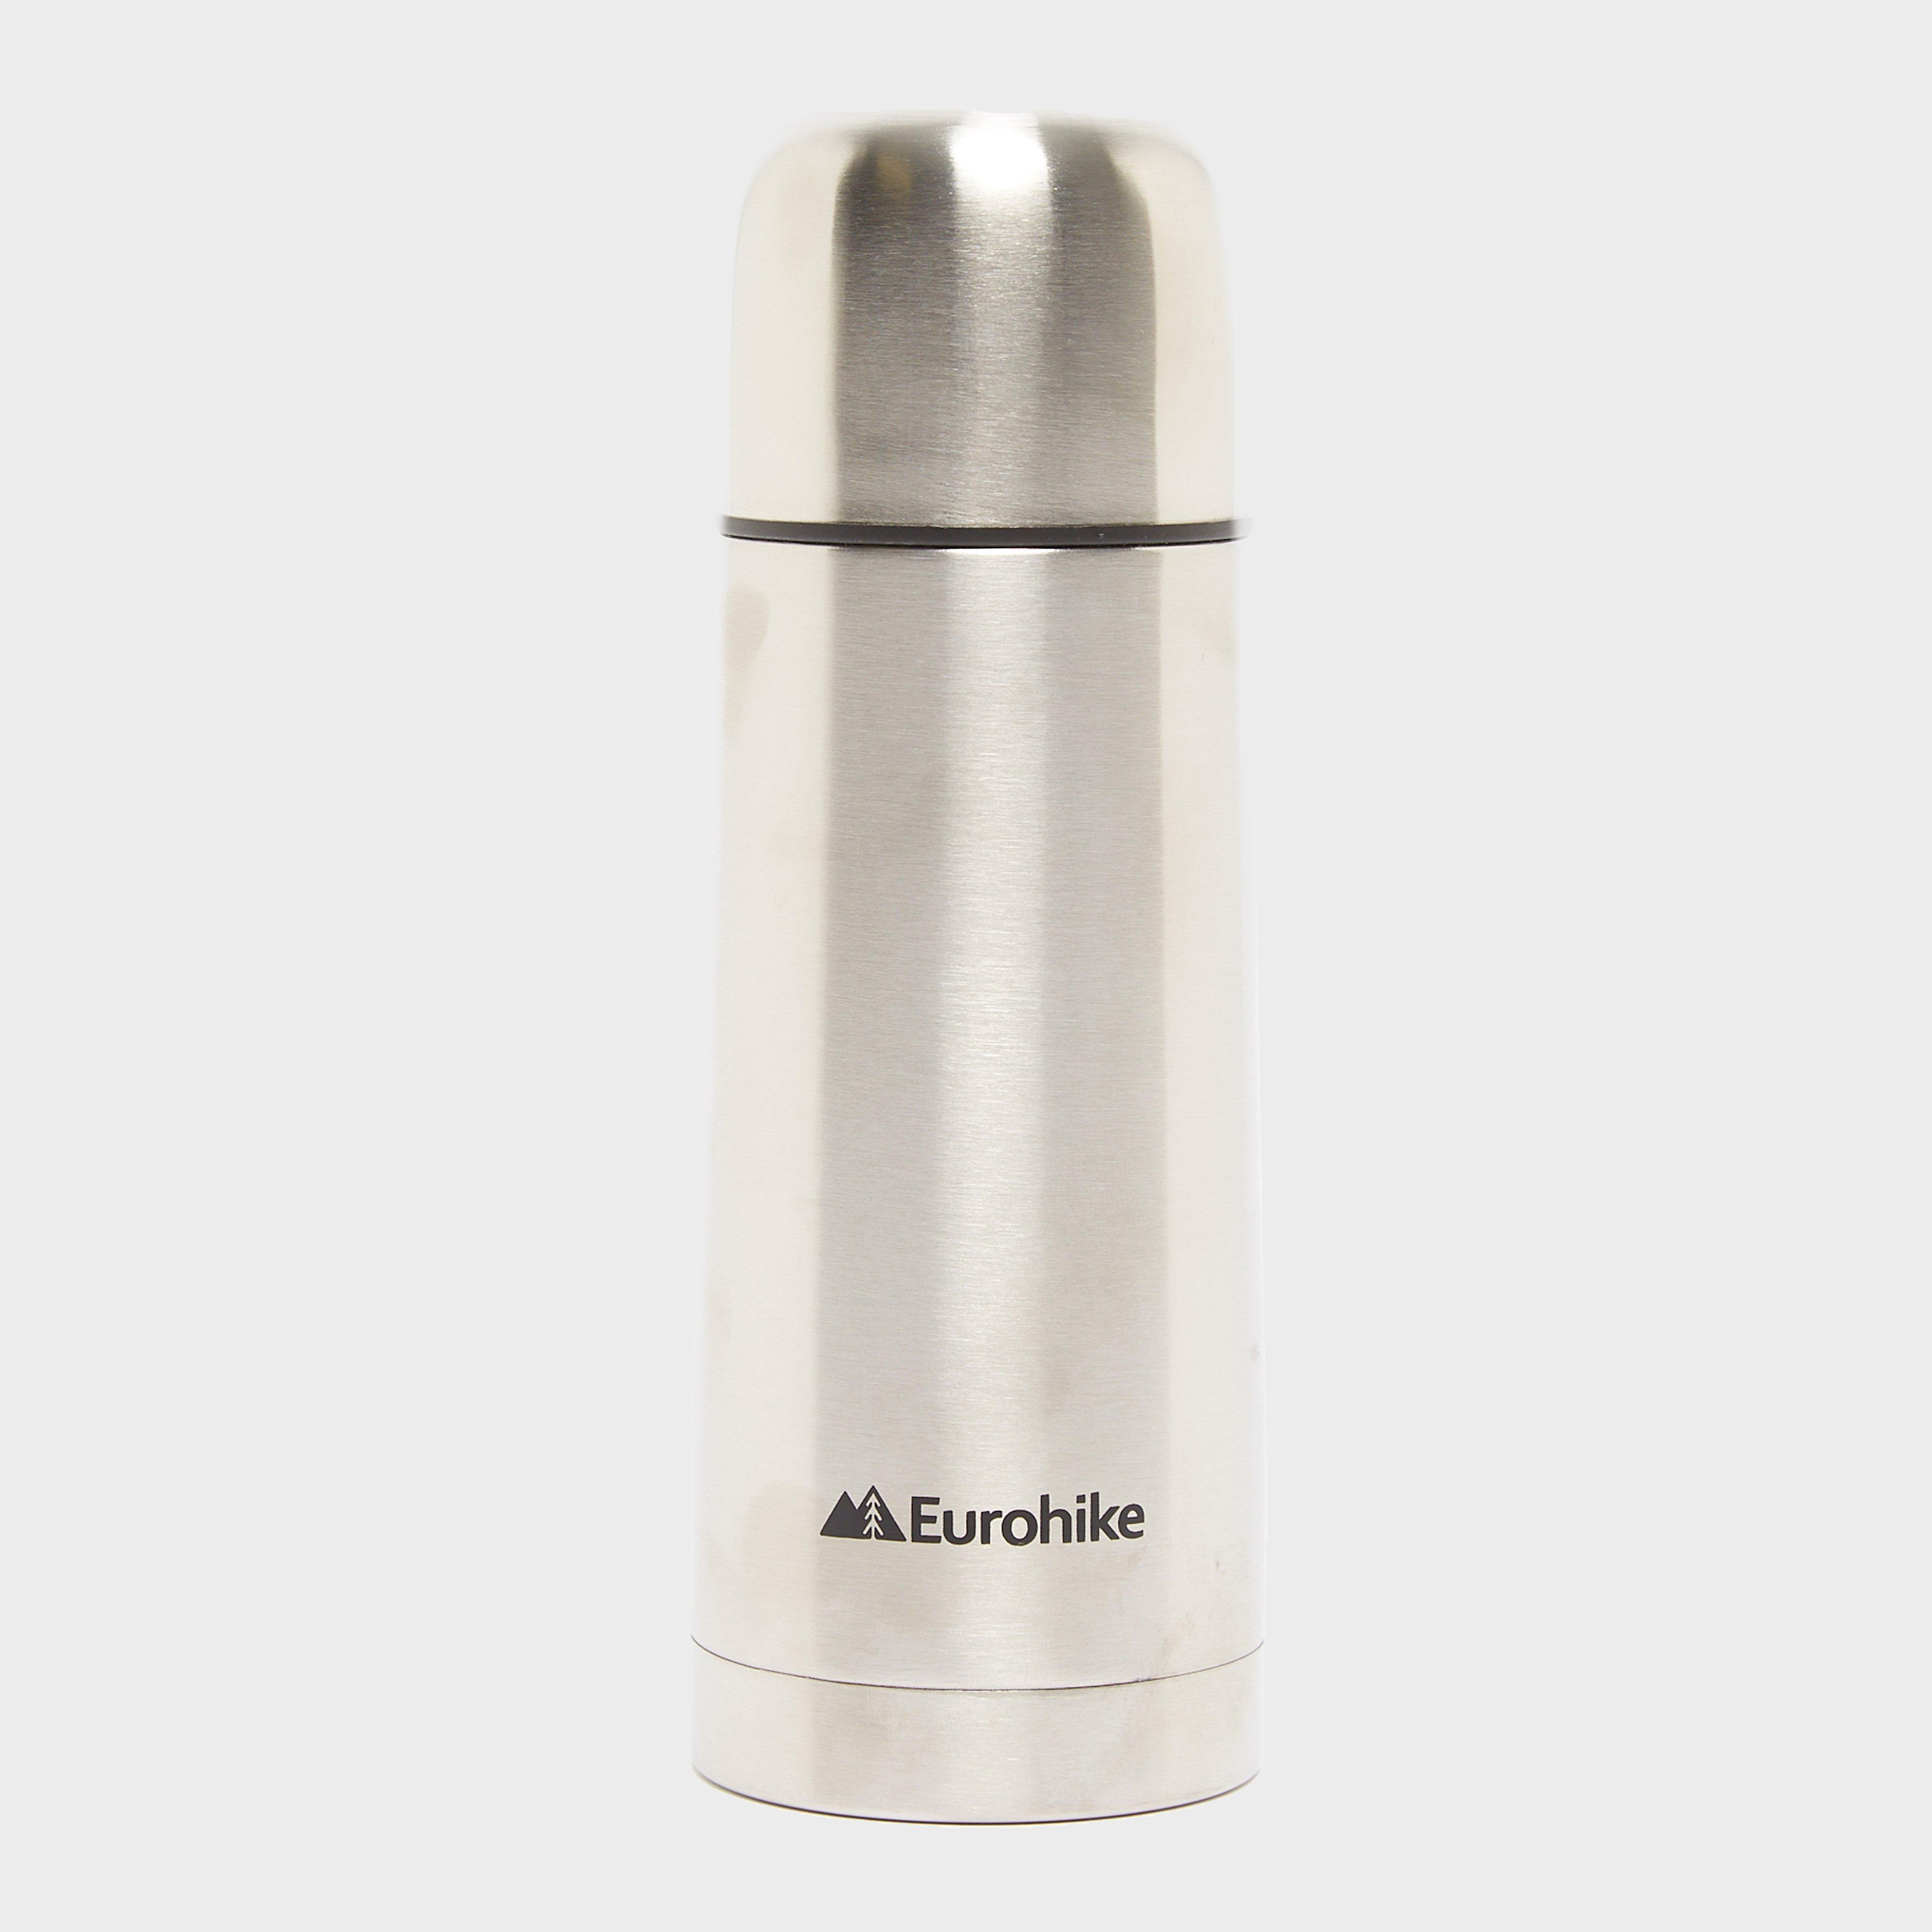 Eurohike Stainless Steel Flask 300ml - Silver/slv  Silver/slv